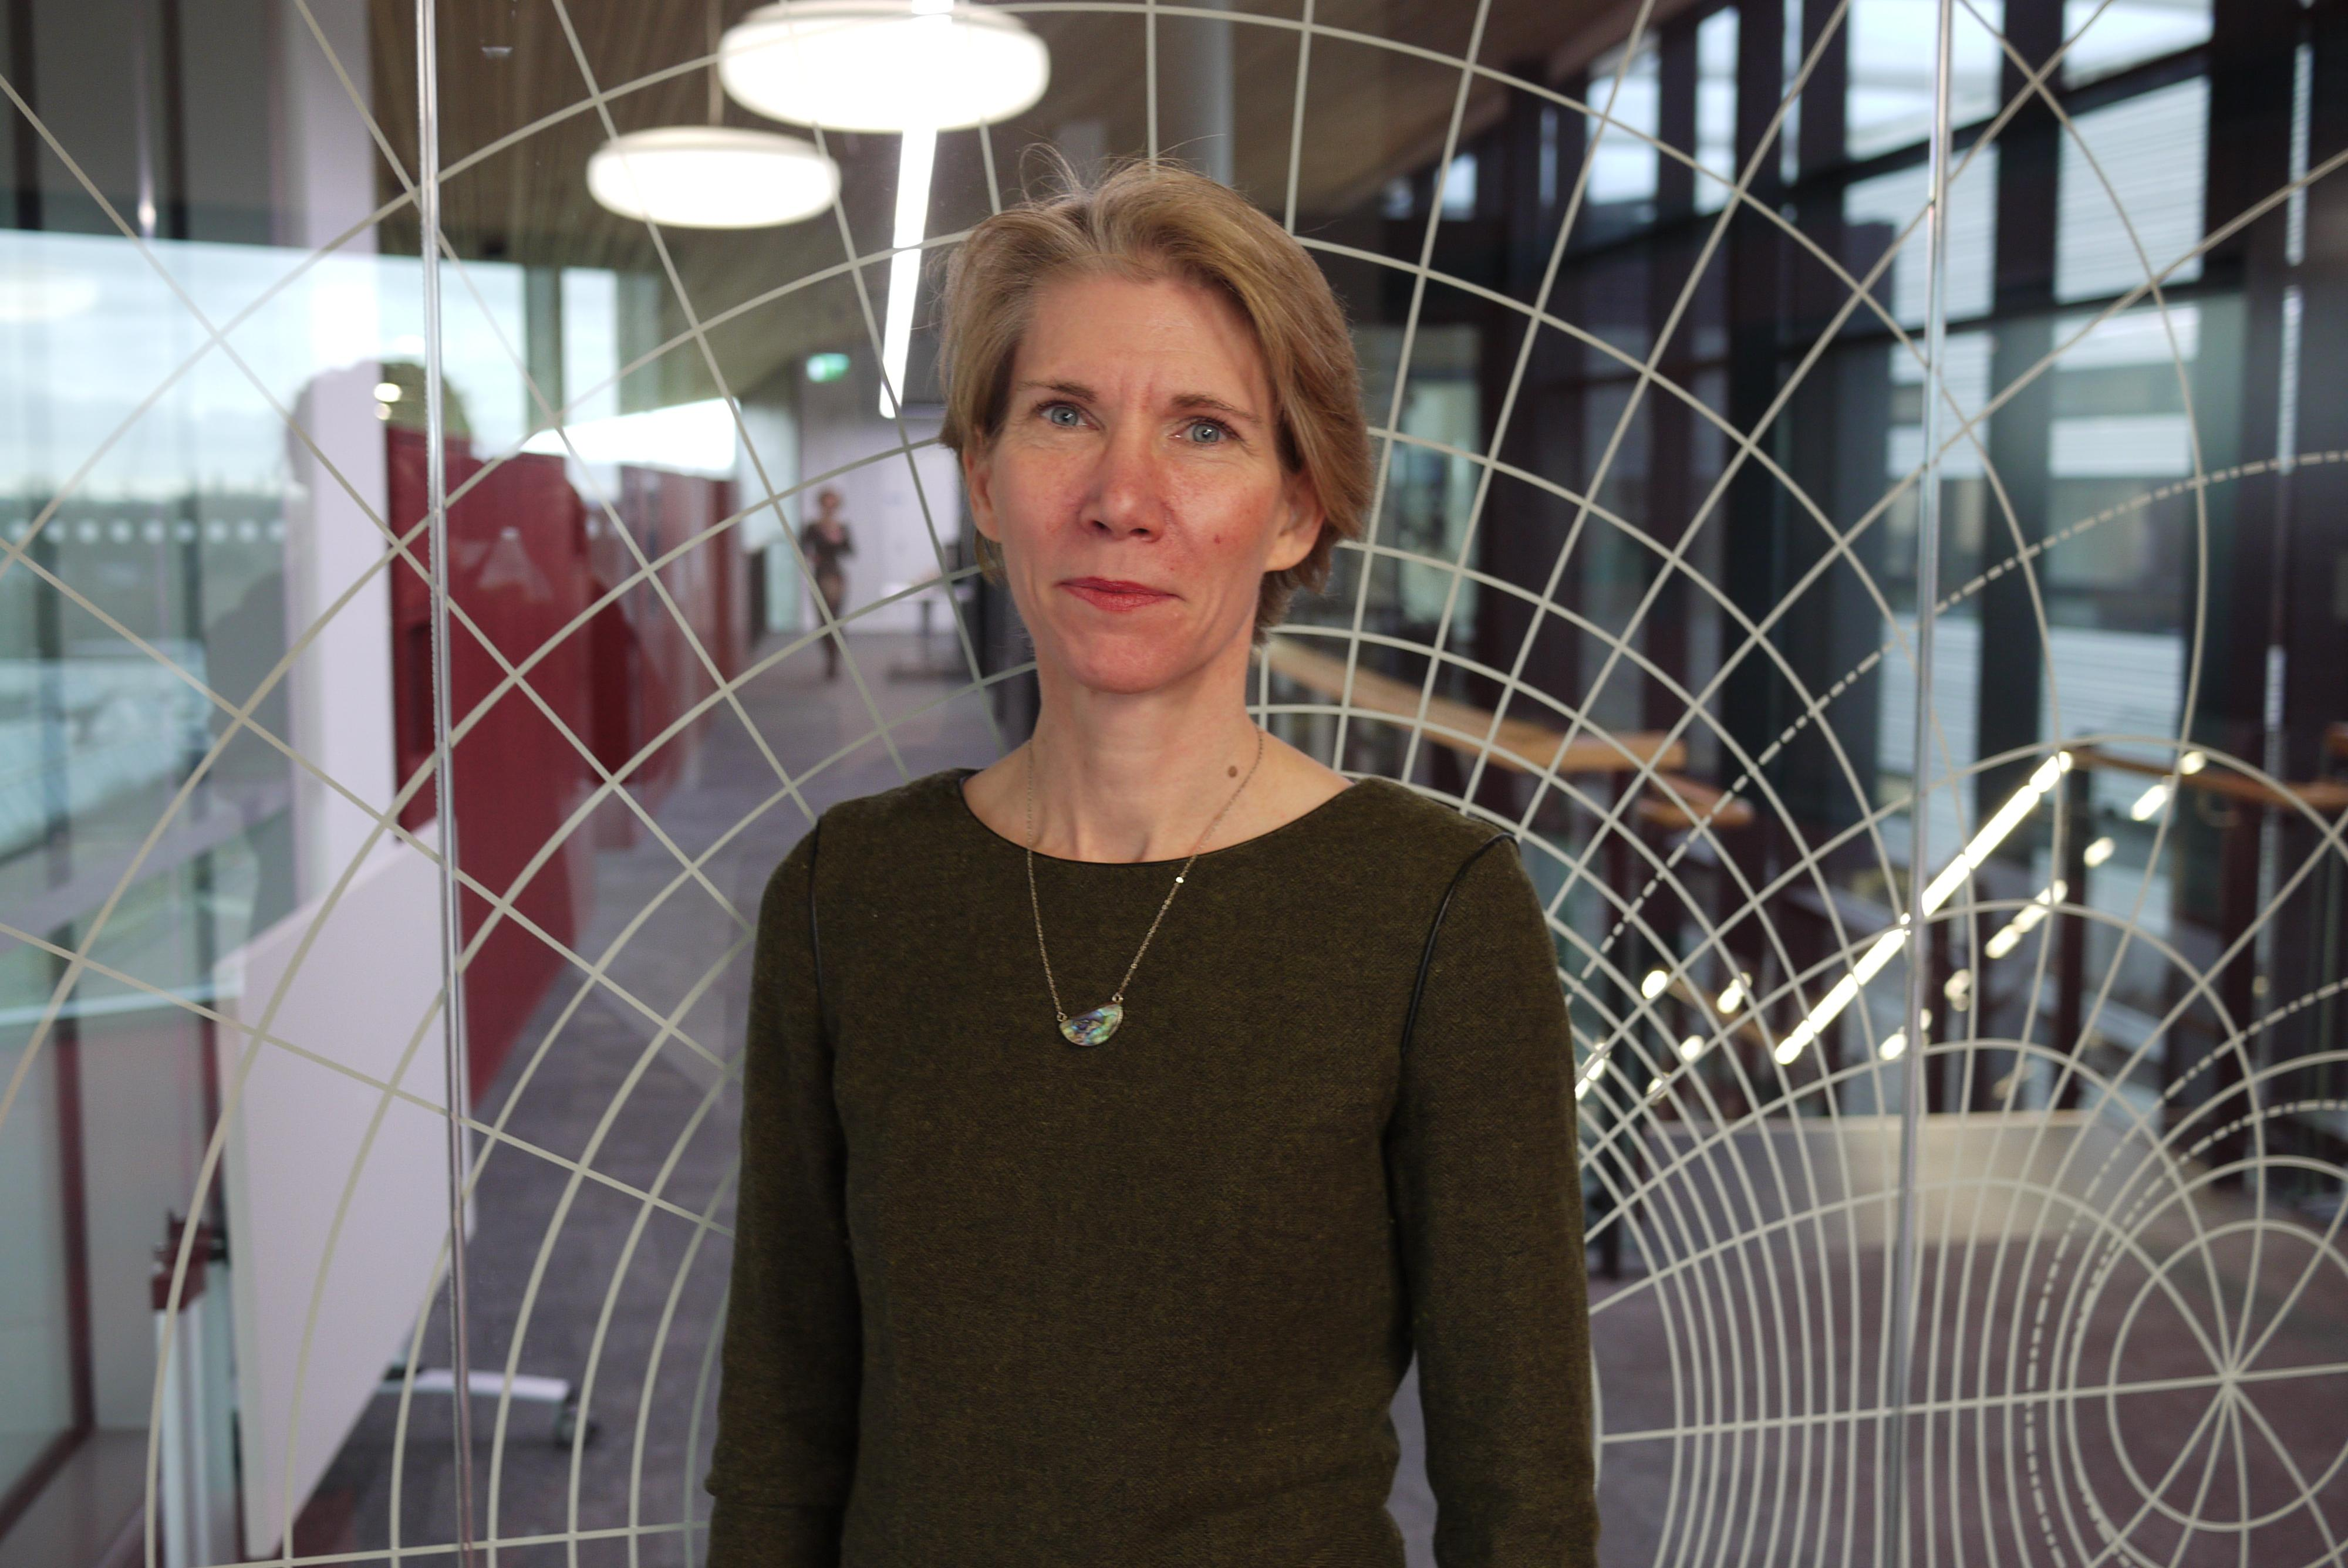 Blog: Alexandra Bolton tells us the latest news from CDBB